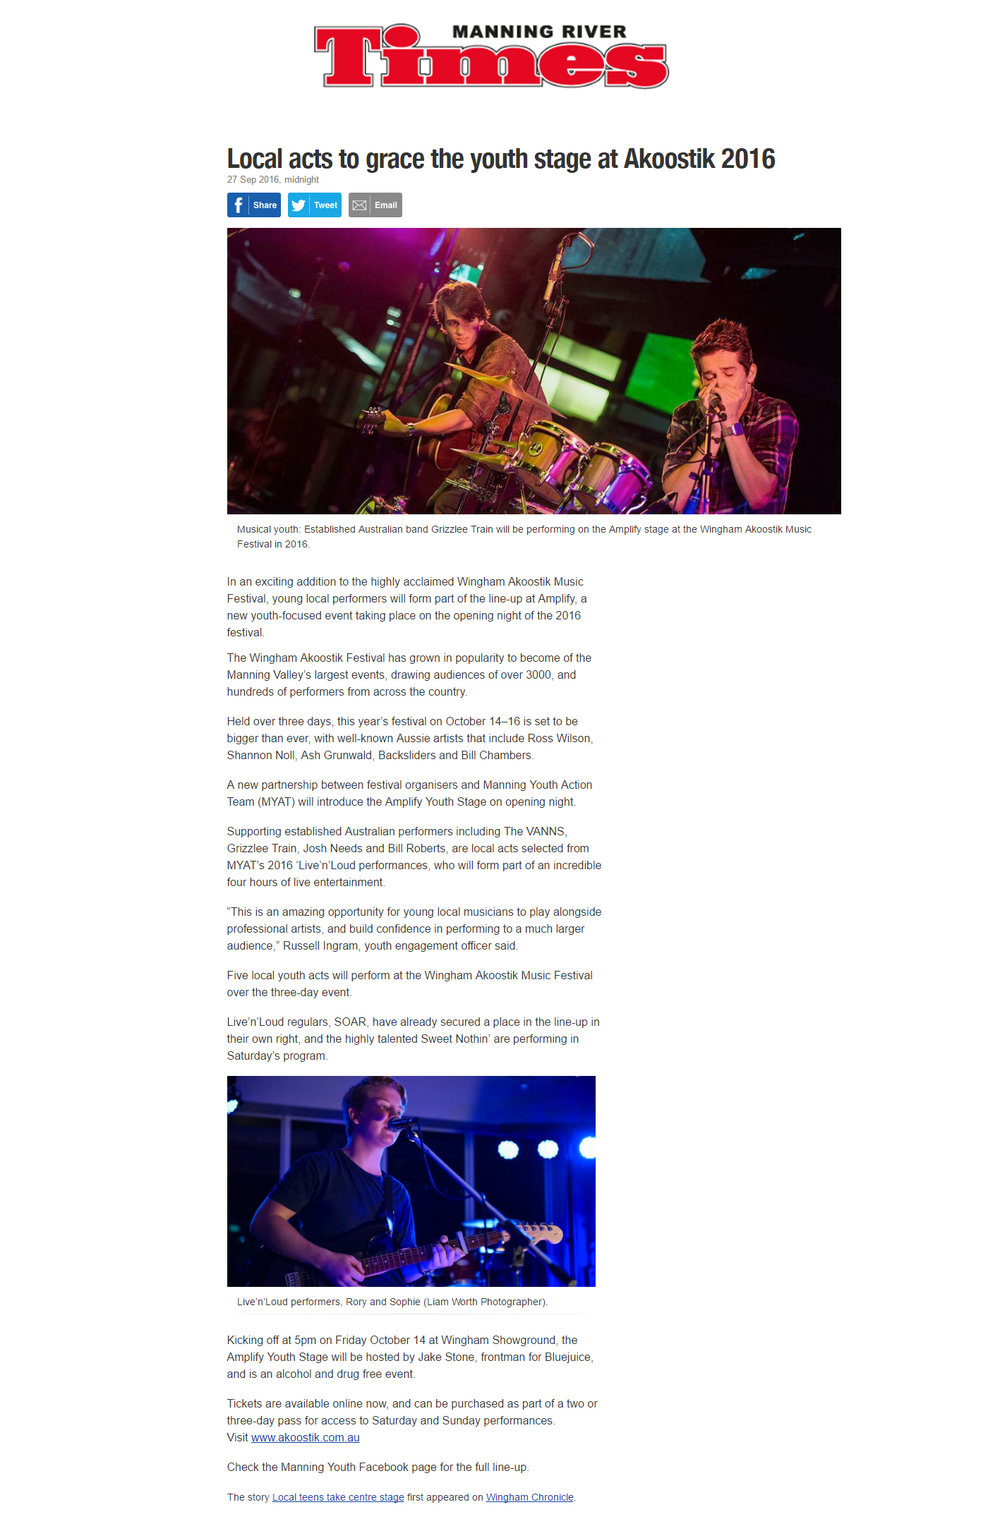 2016 Akoostik Festival Amplify Youth Stage Promotion -